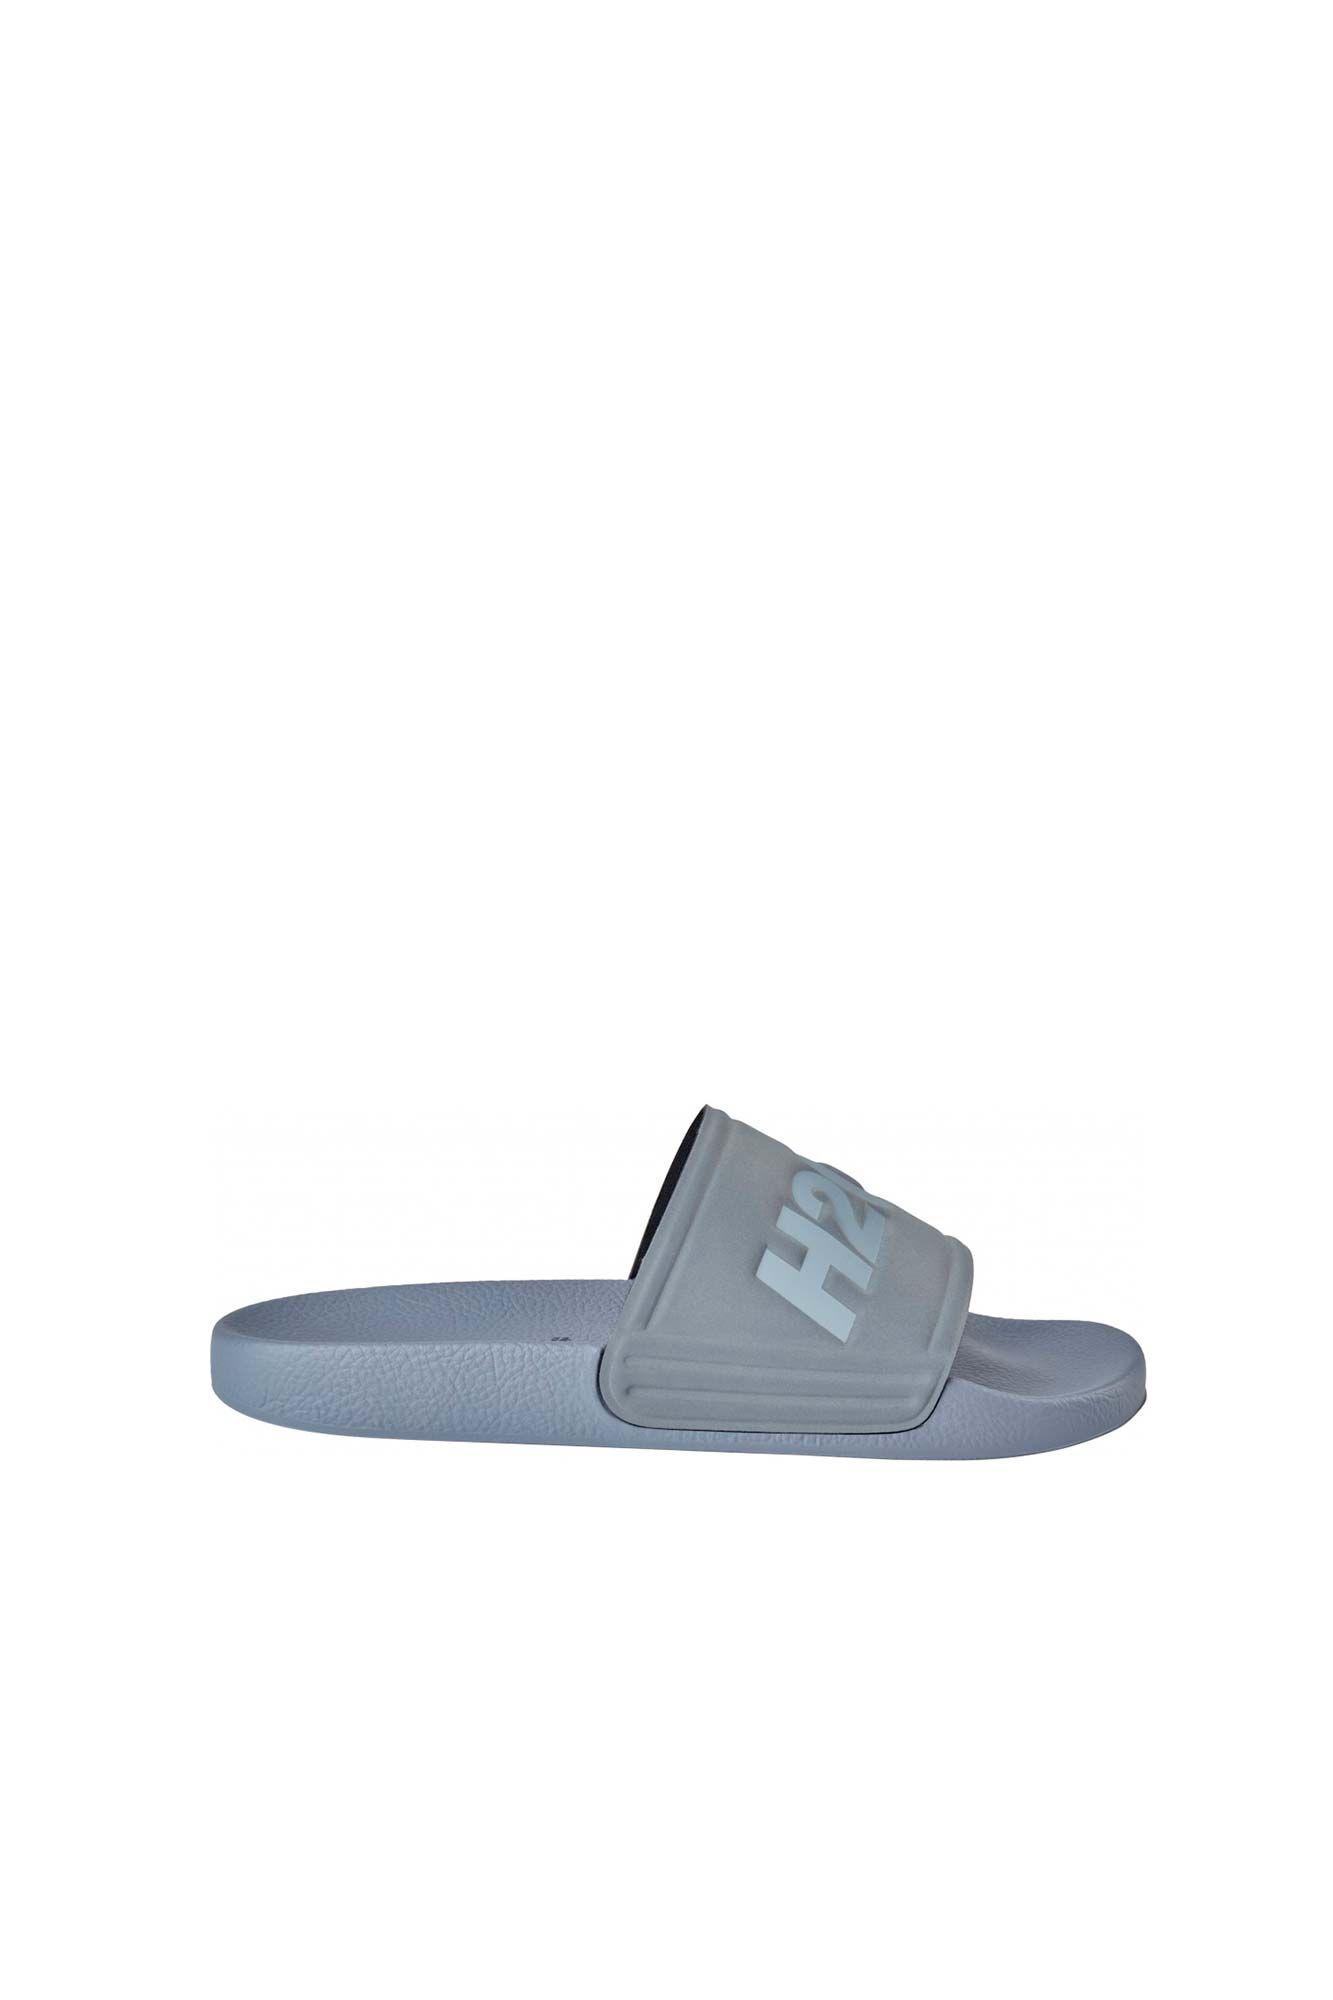 Sundal sandal FA900023, LIGHT GREY